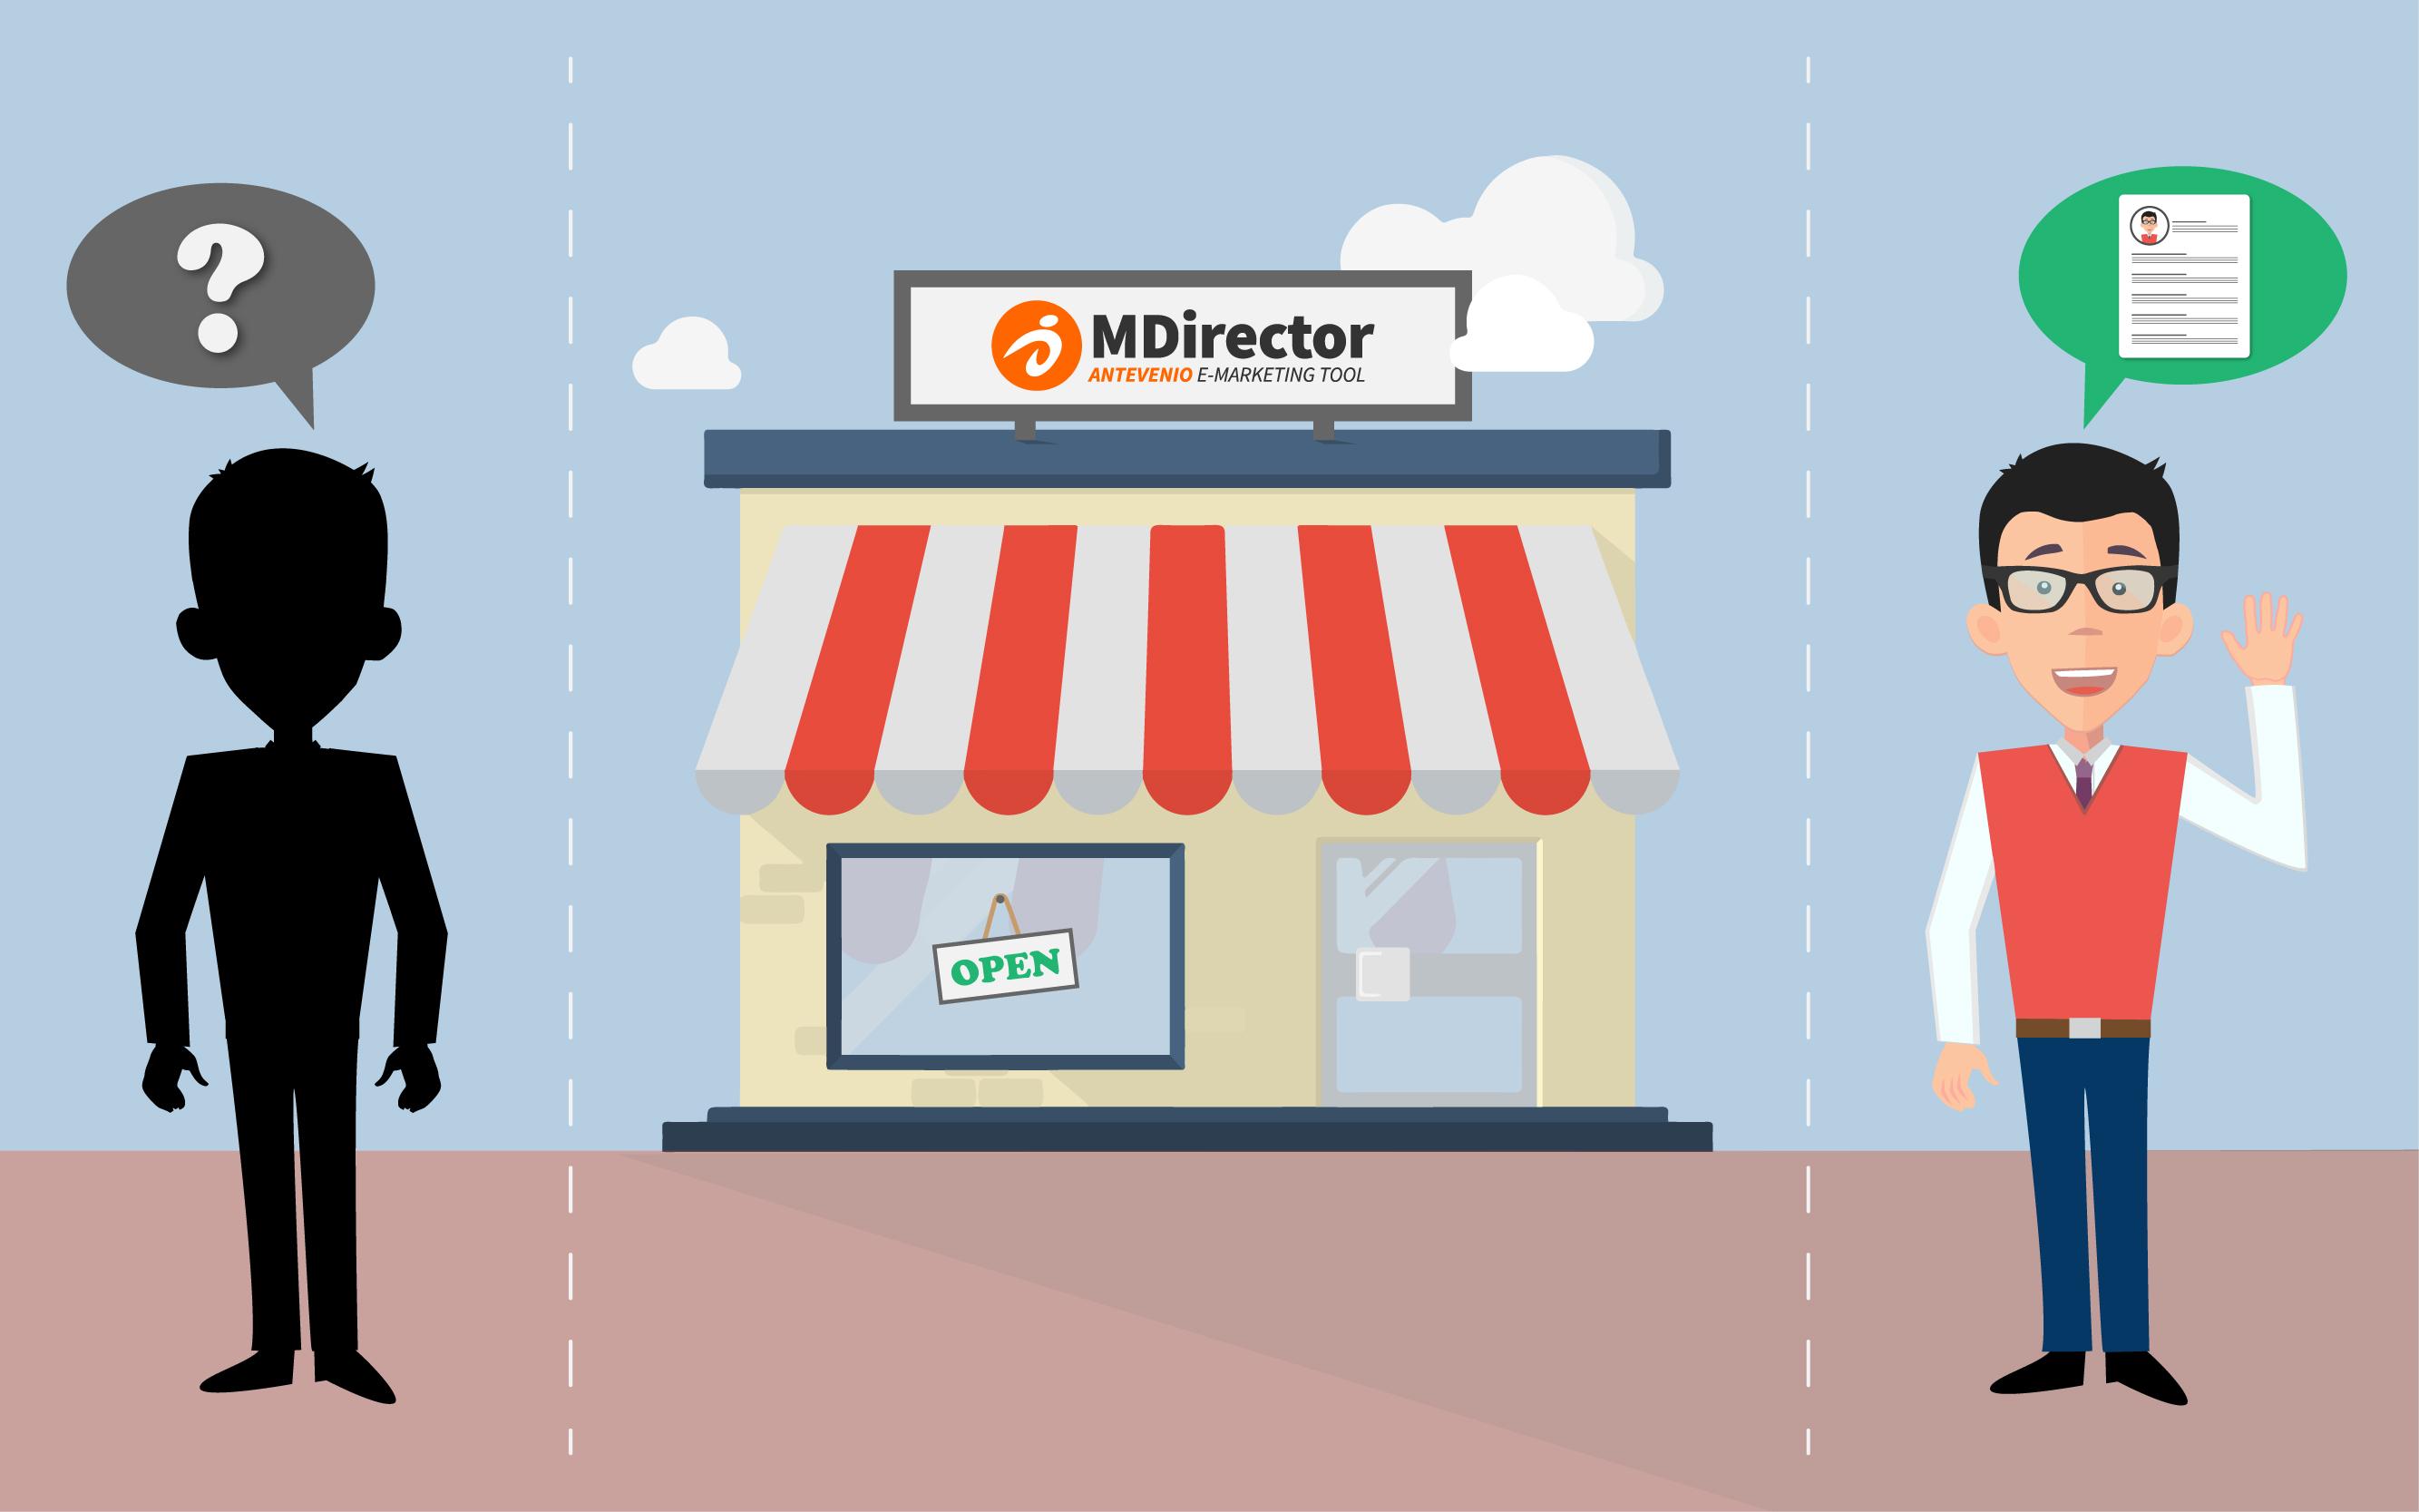 MDirector CRM Retargeting